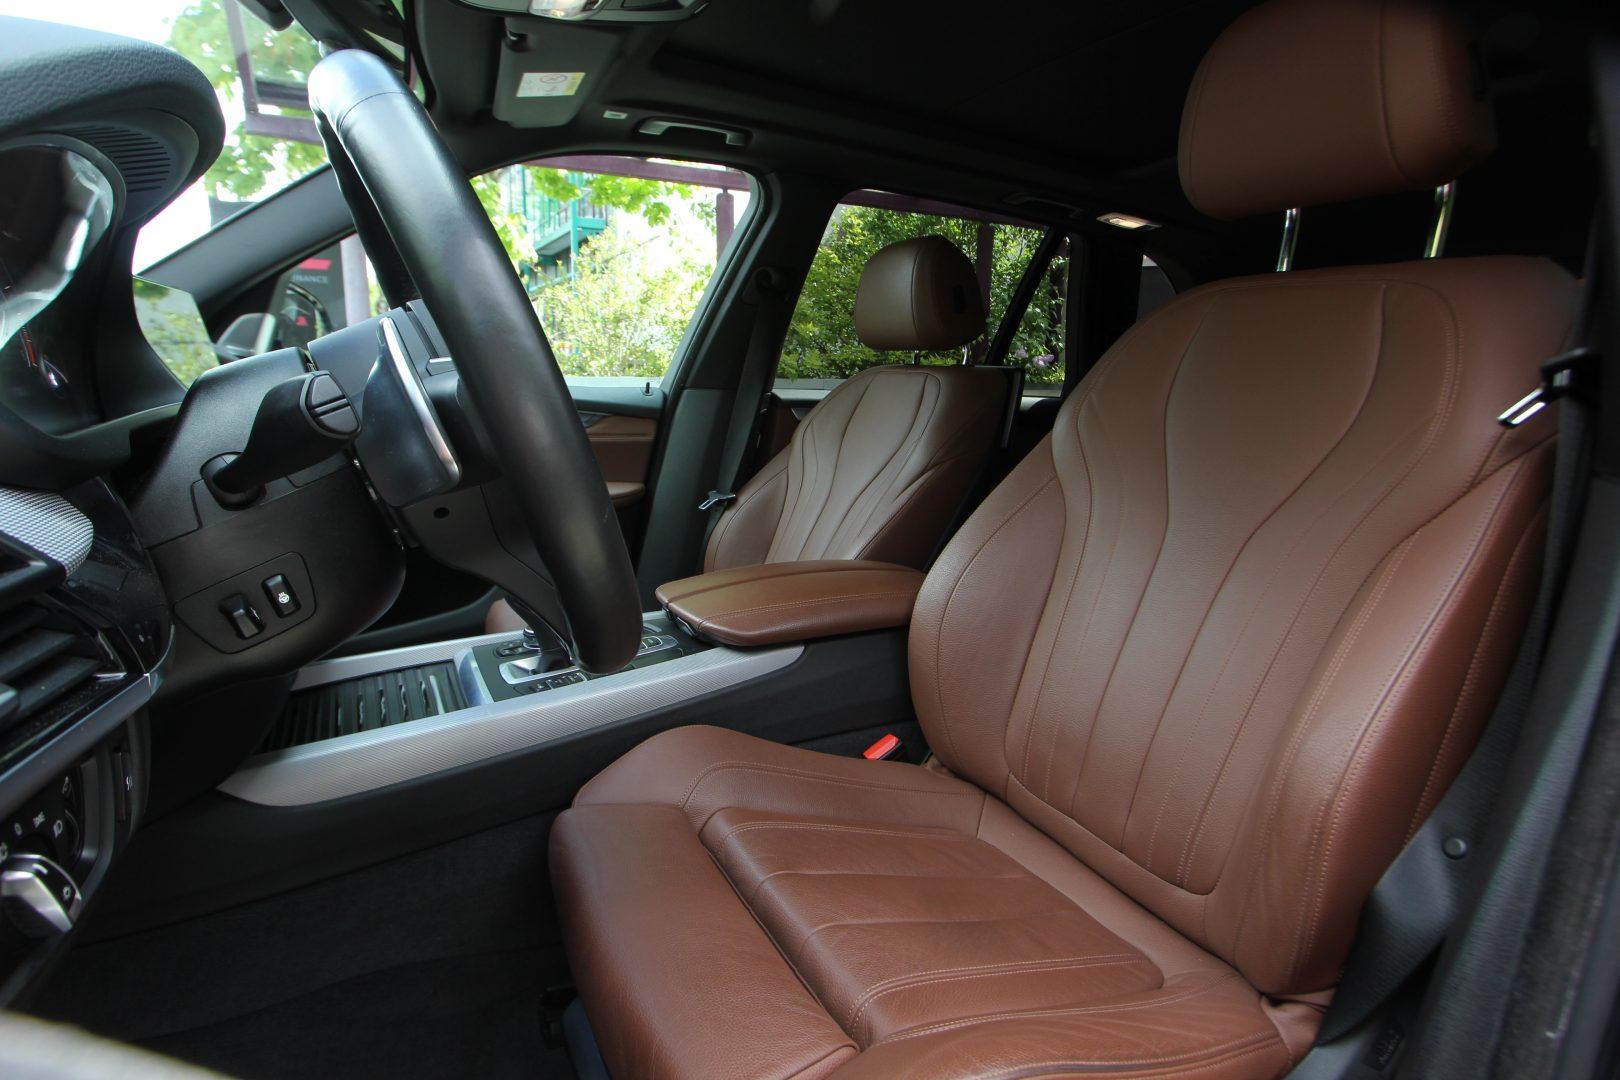 AIL BMW X5 M50d Bang & Olufsen Panorama RSE 12